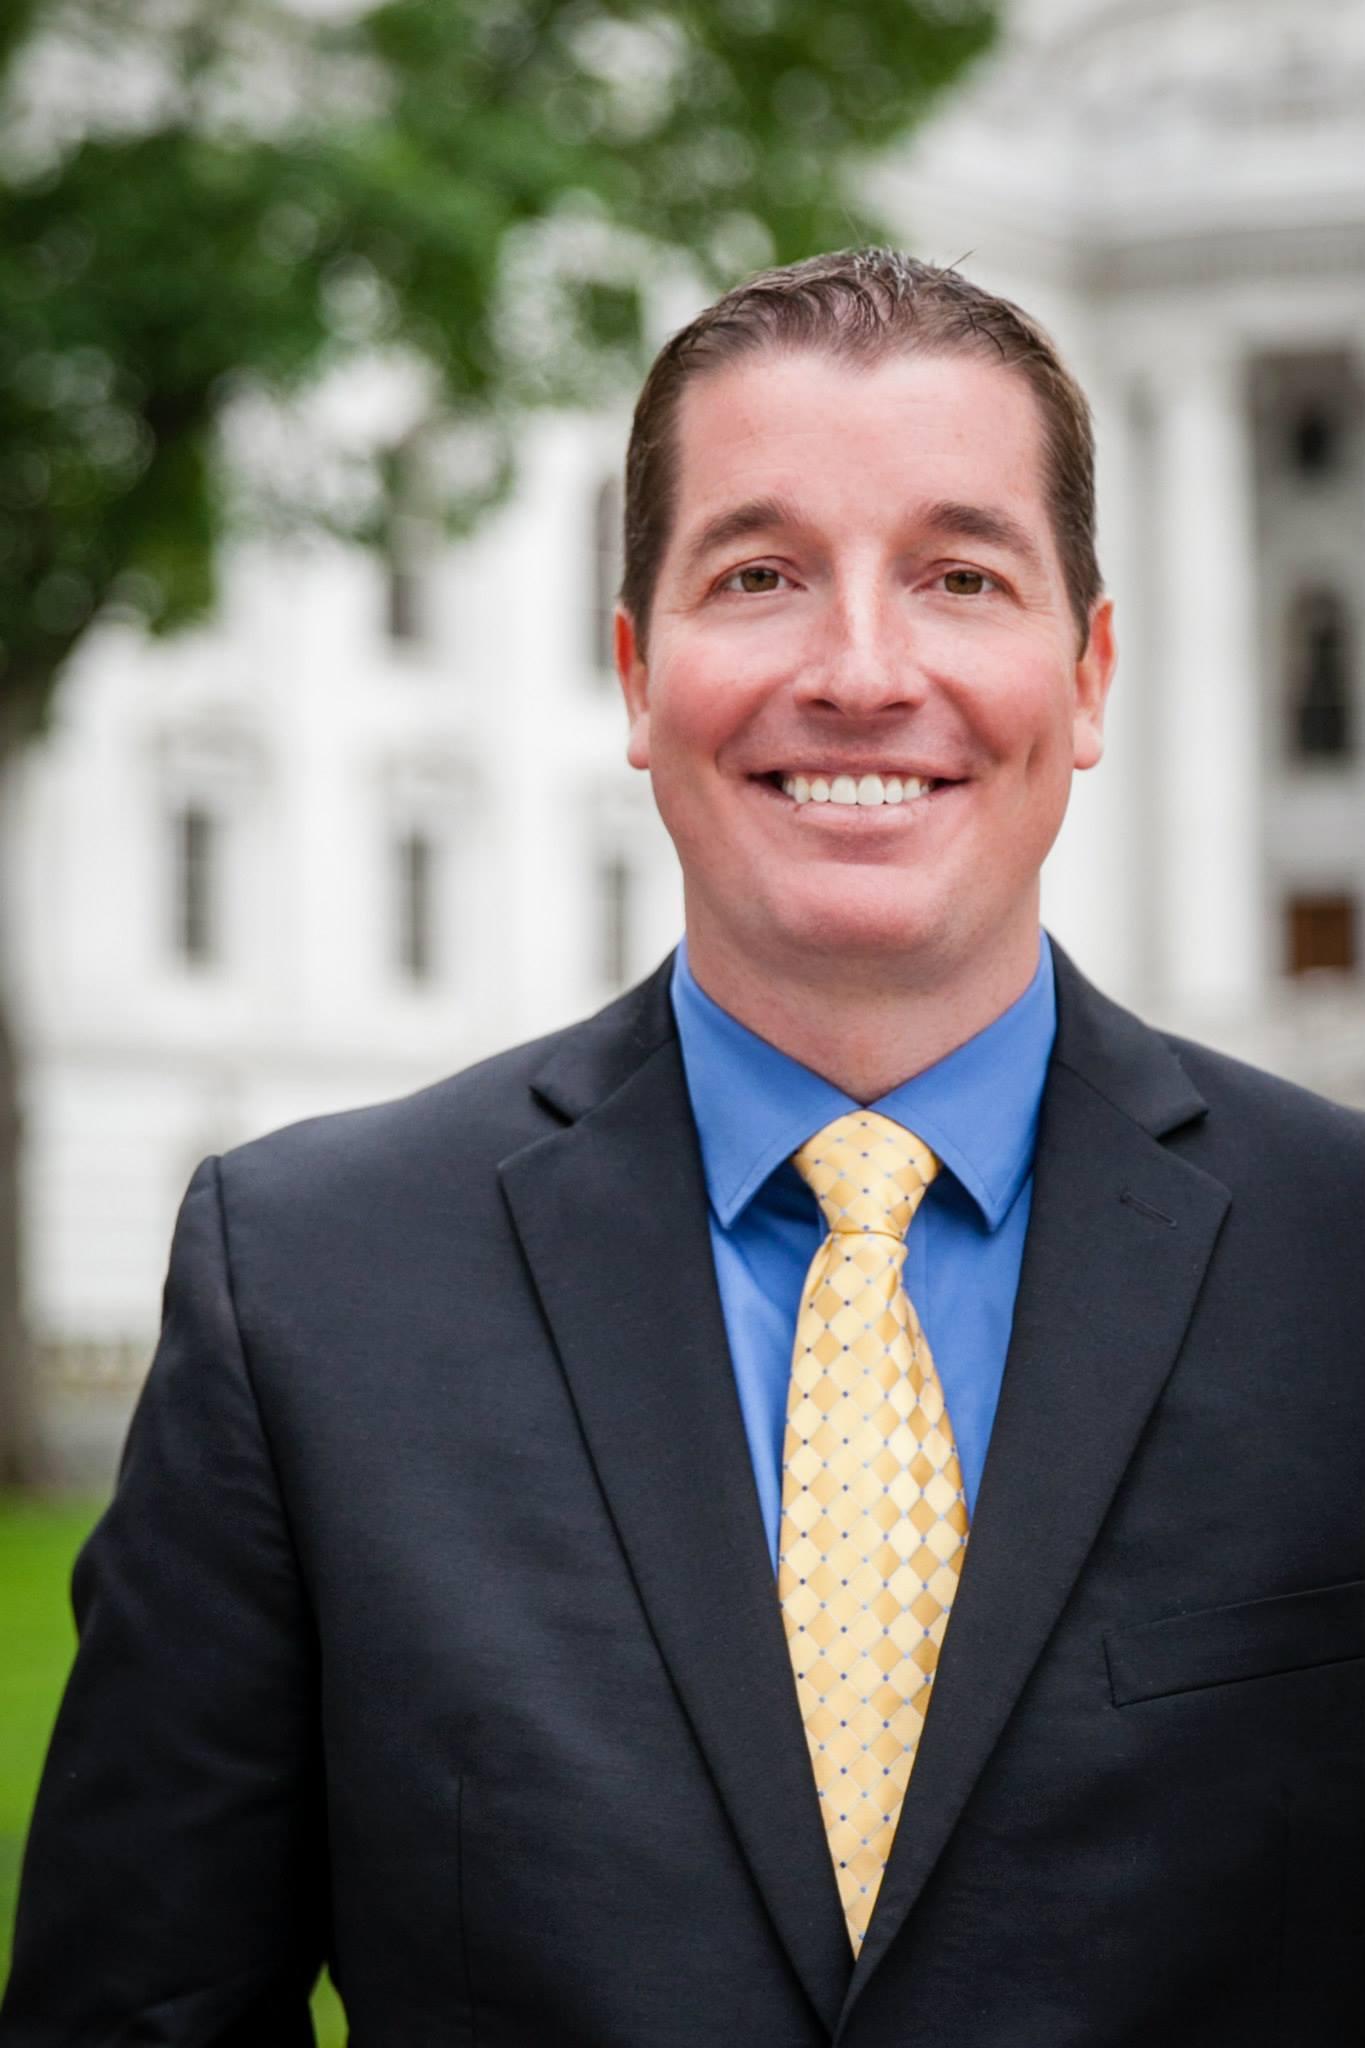 Tim Fandek Headshot Wisconsin DECA Director